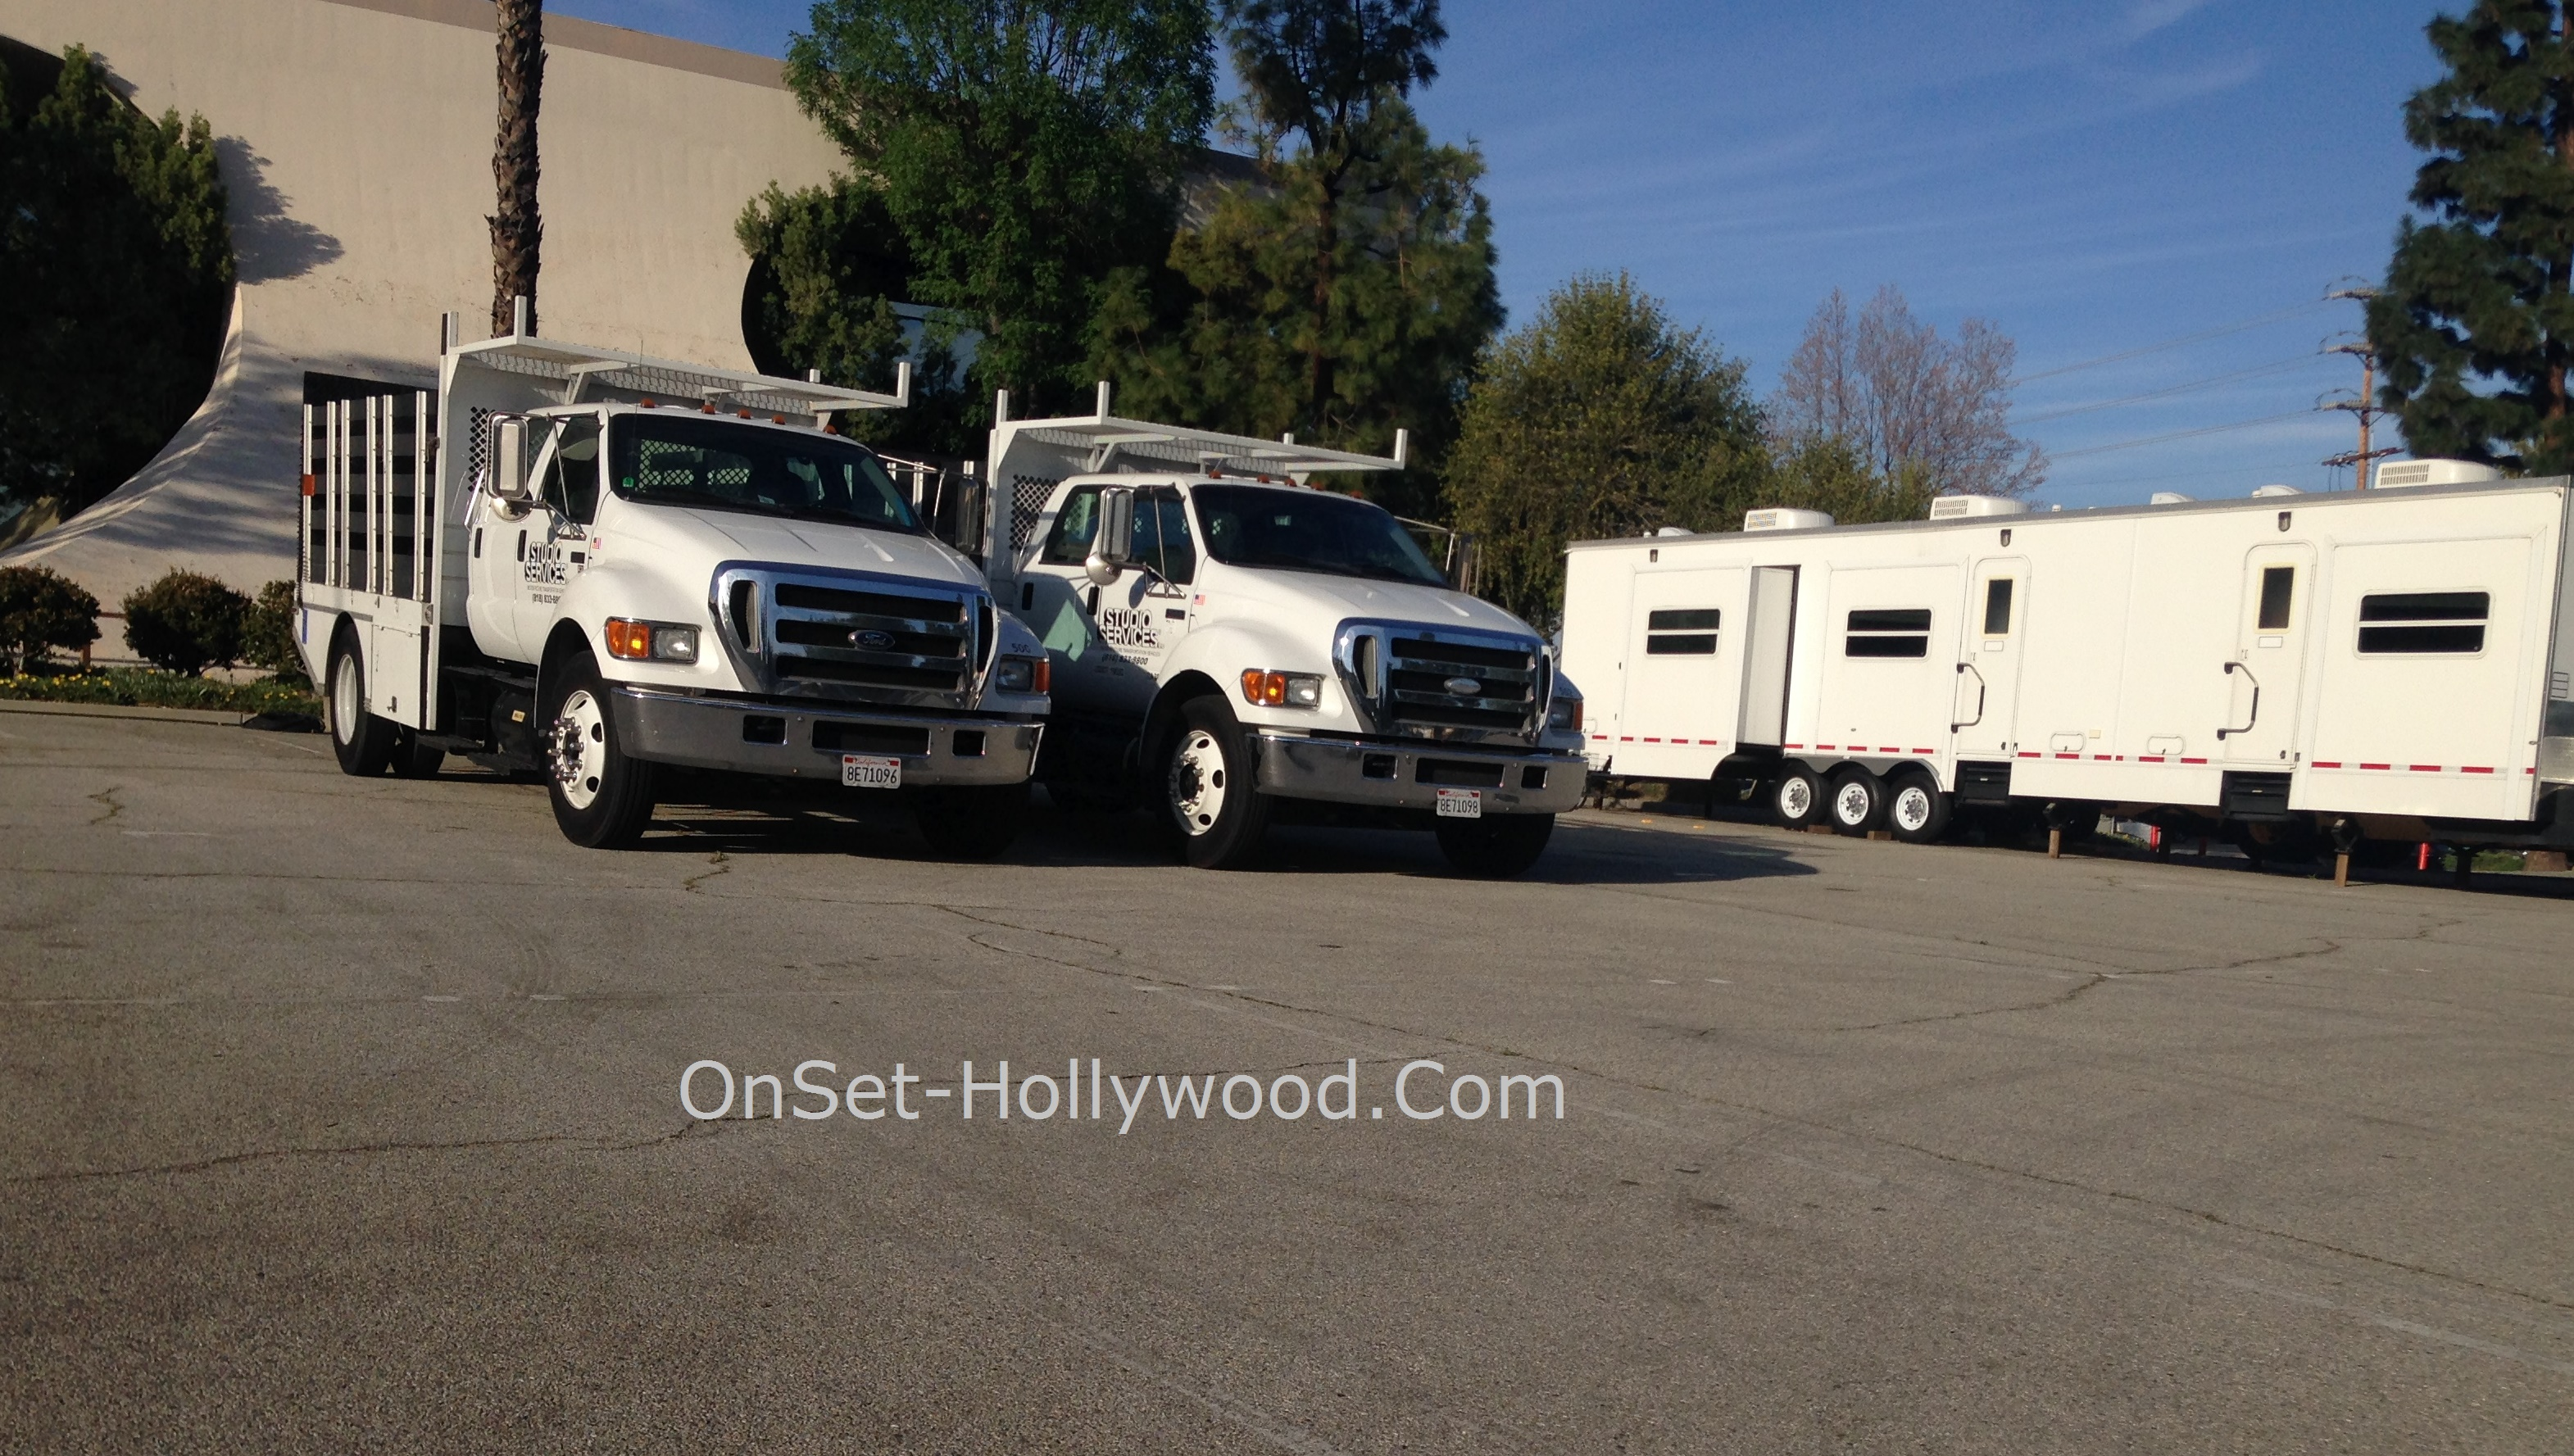 teen-wolf-filming-locations-chatsworth-trucks